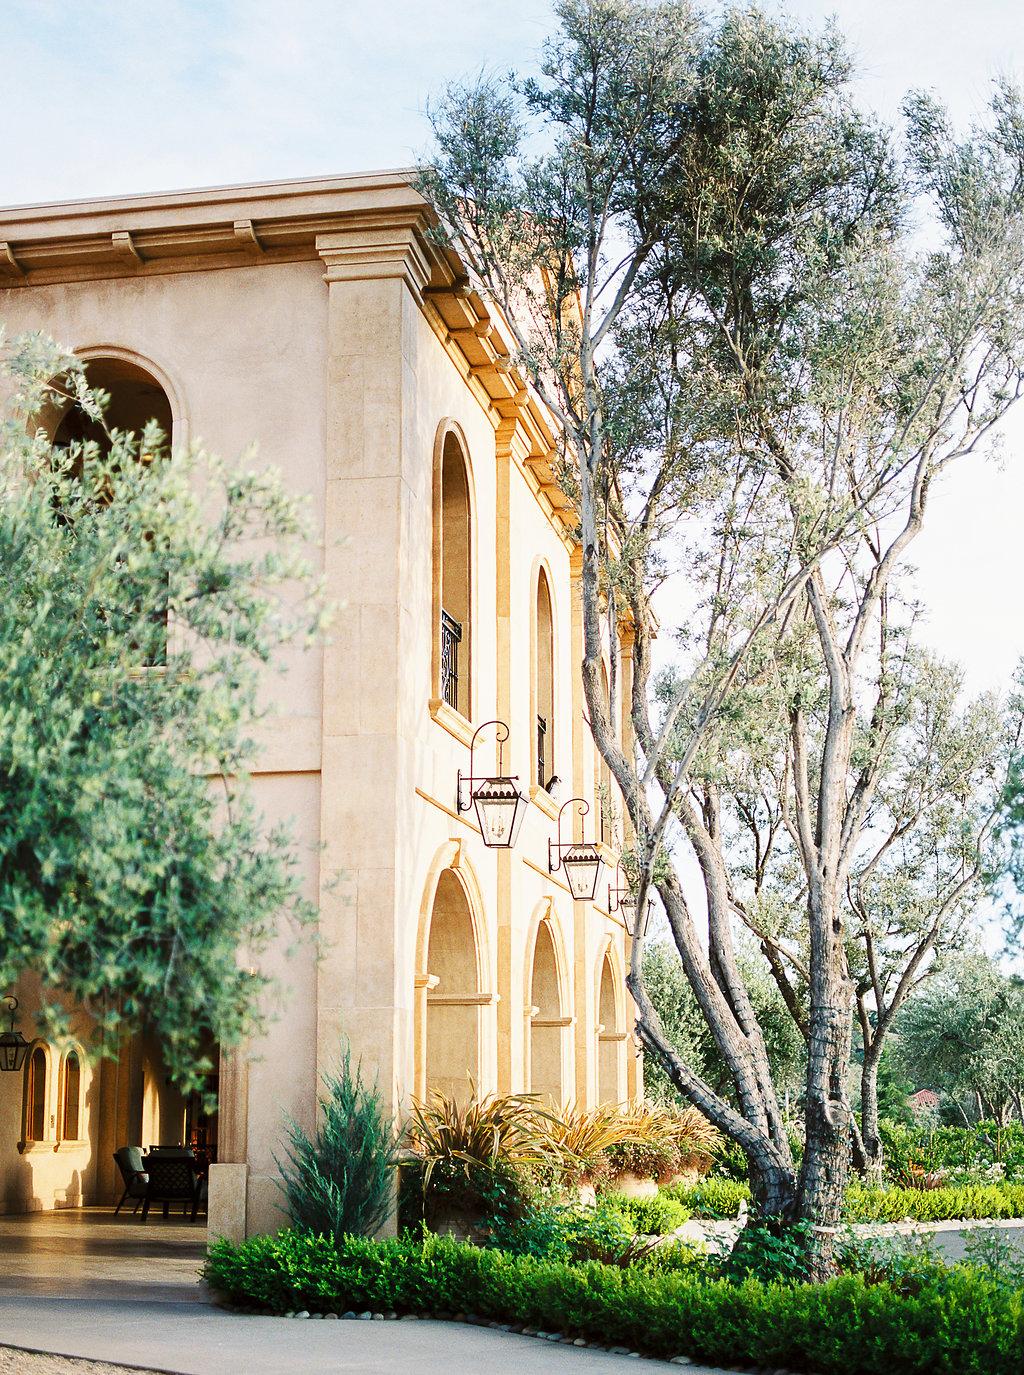 Paso Robles California - Allegretto Resort and Vineyards - Bridal Session - fine art film photographer Tanja Kibogo12.JPG